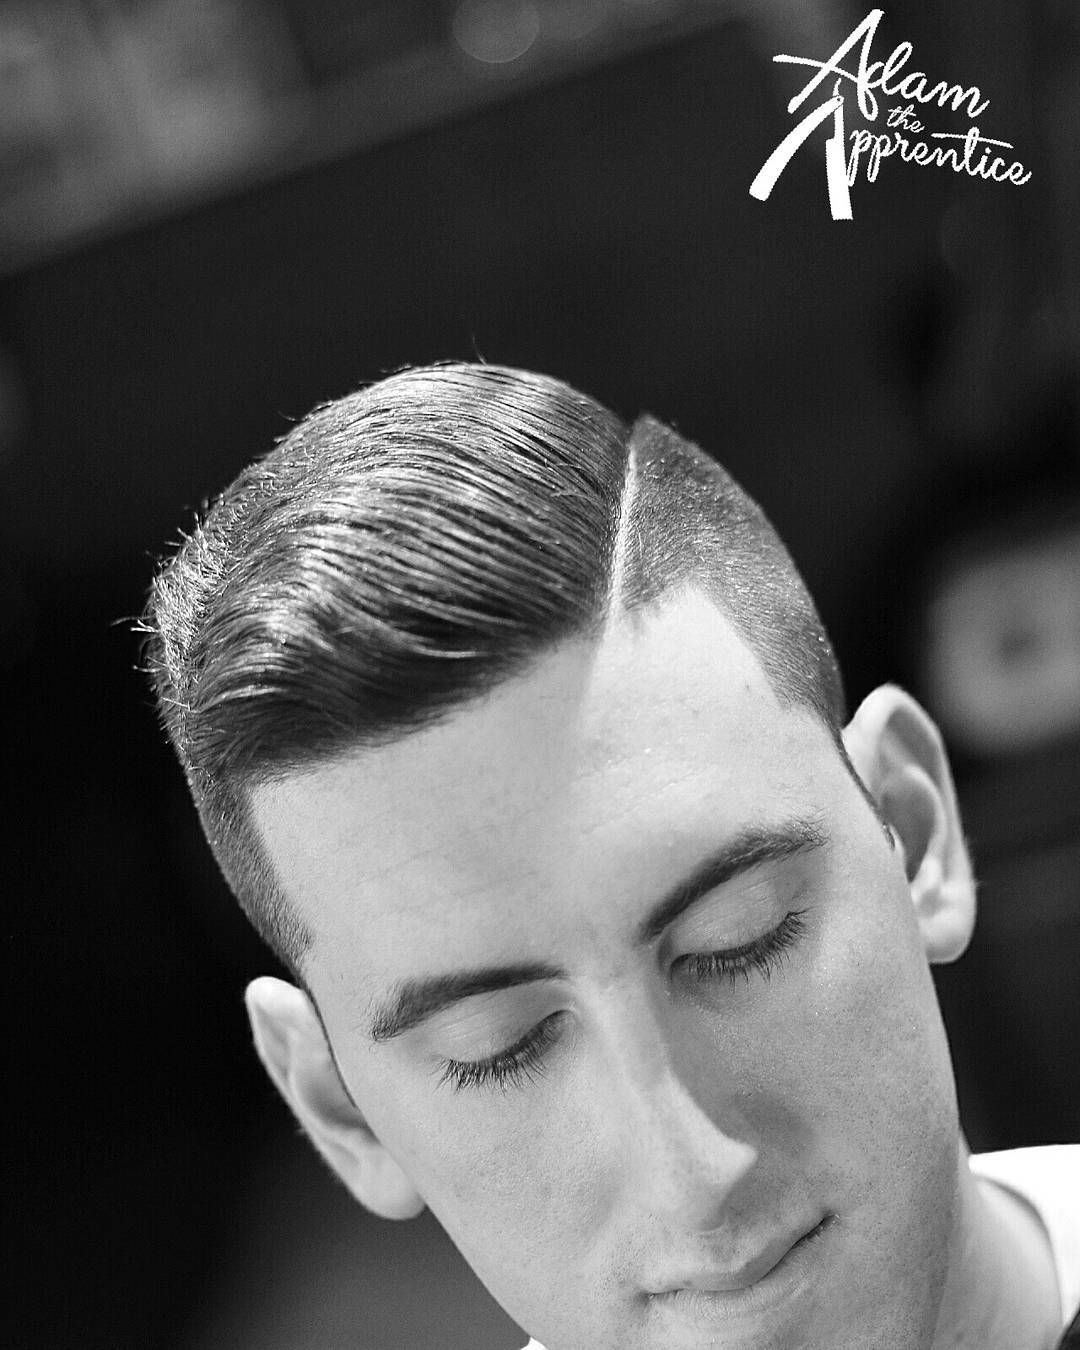 Haircut by adamtheapprentice http://ift.tt/1YvXIFe #menshair #menshairstyles #menshaircuts #hairstylesformen #coolhaircuts #coolhairstyles #haircuts #hairstyles #barbers